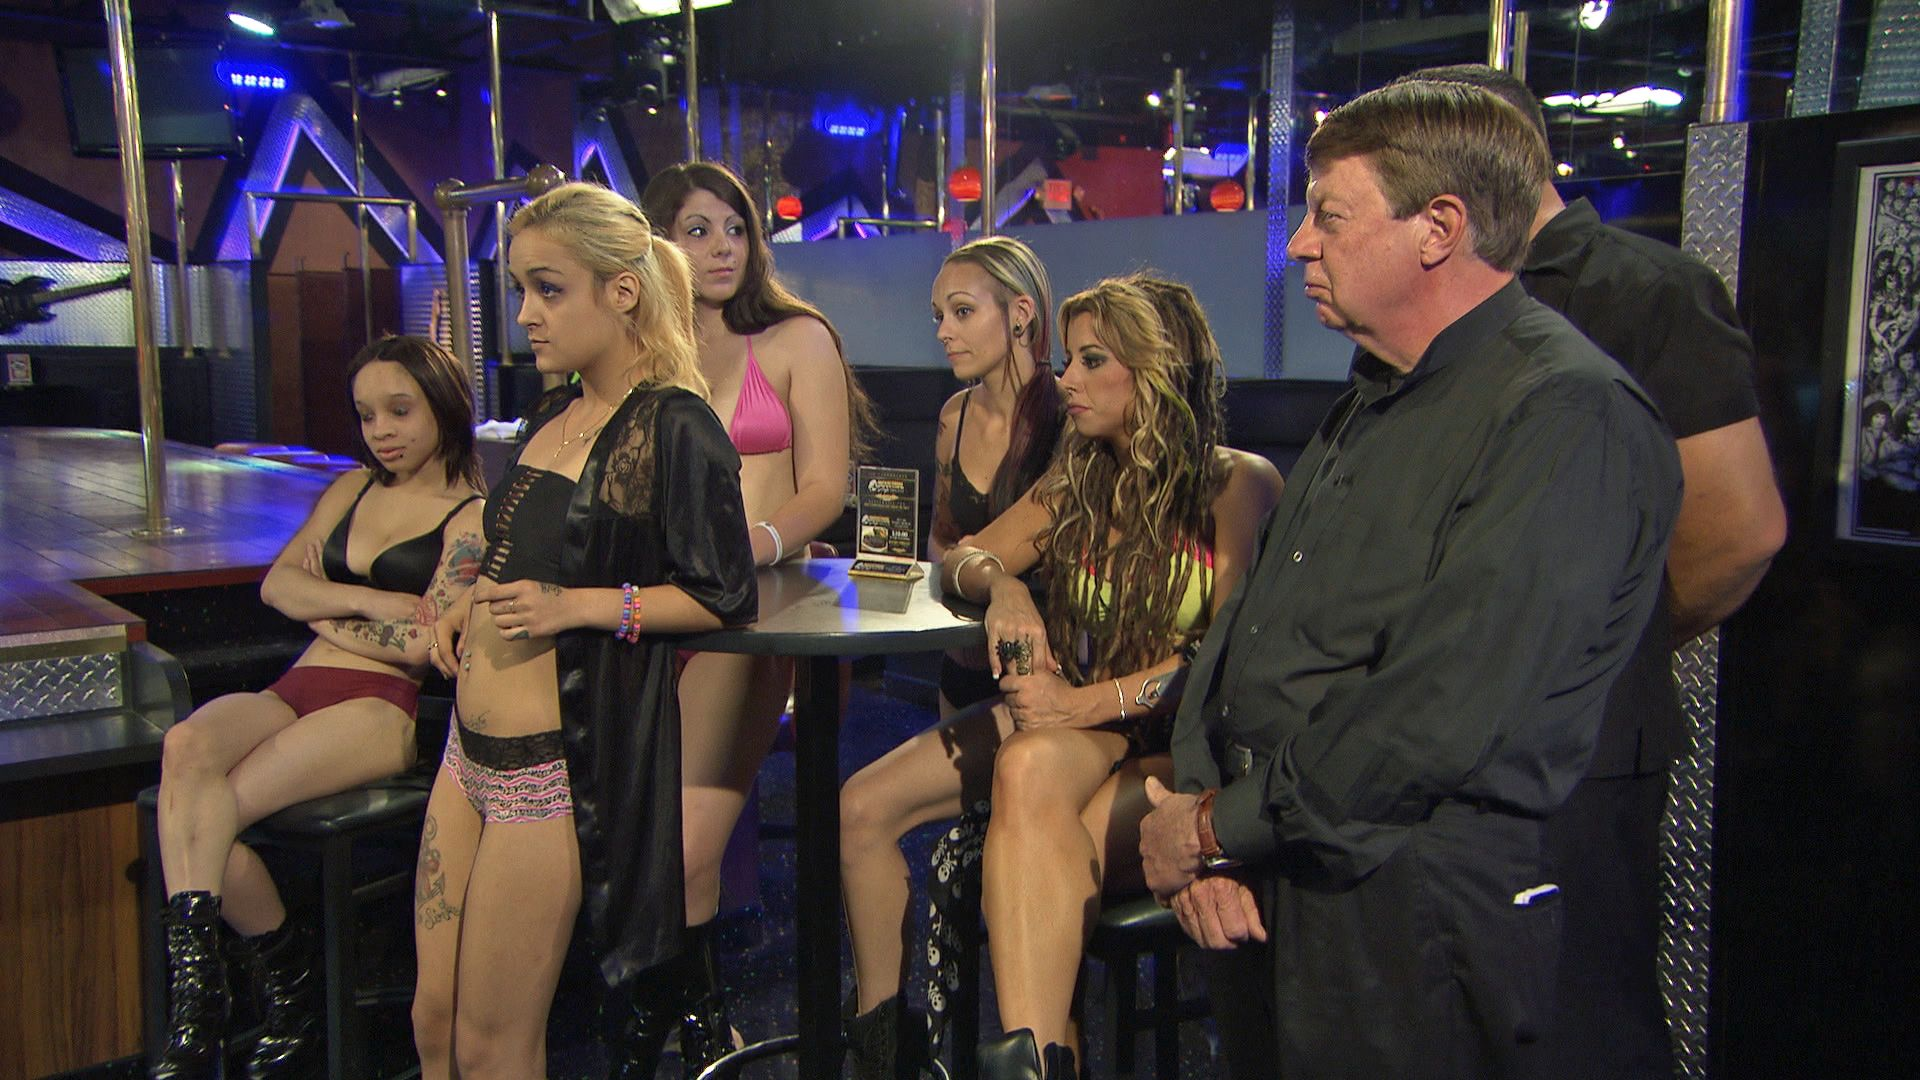 Jackson mississippi strip club babe